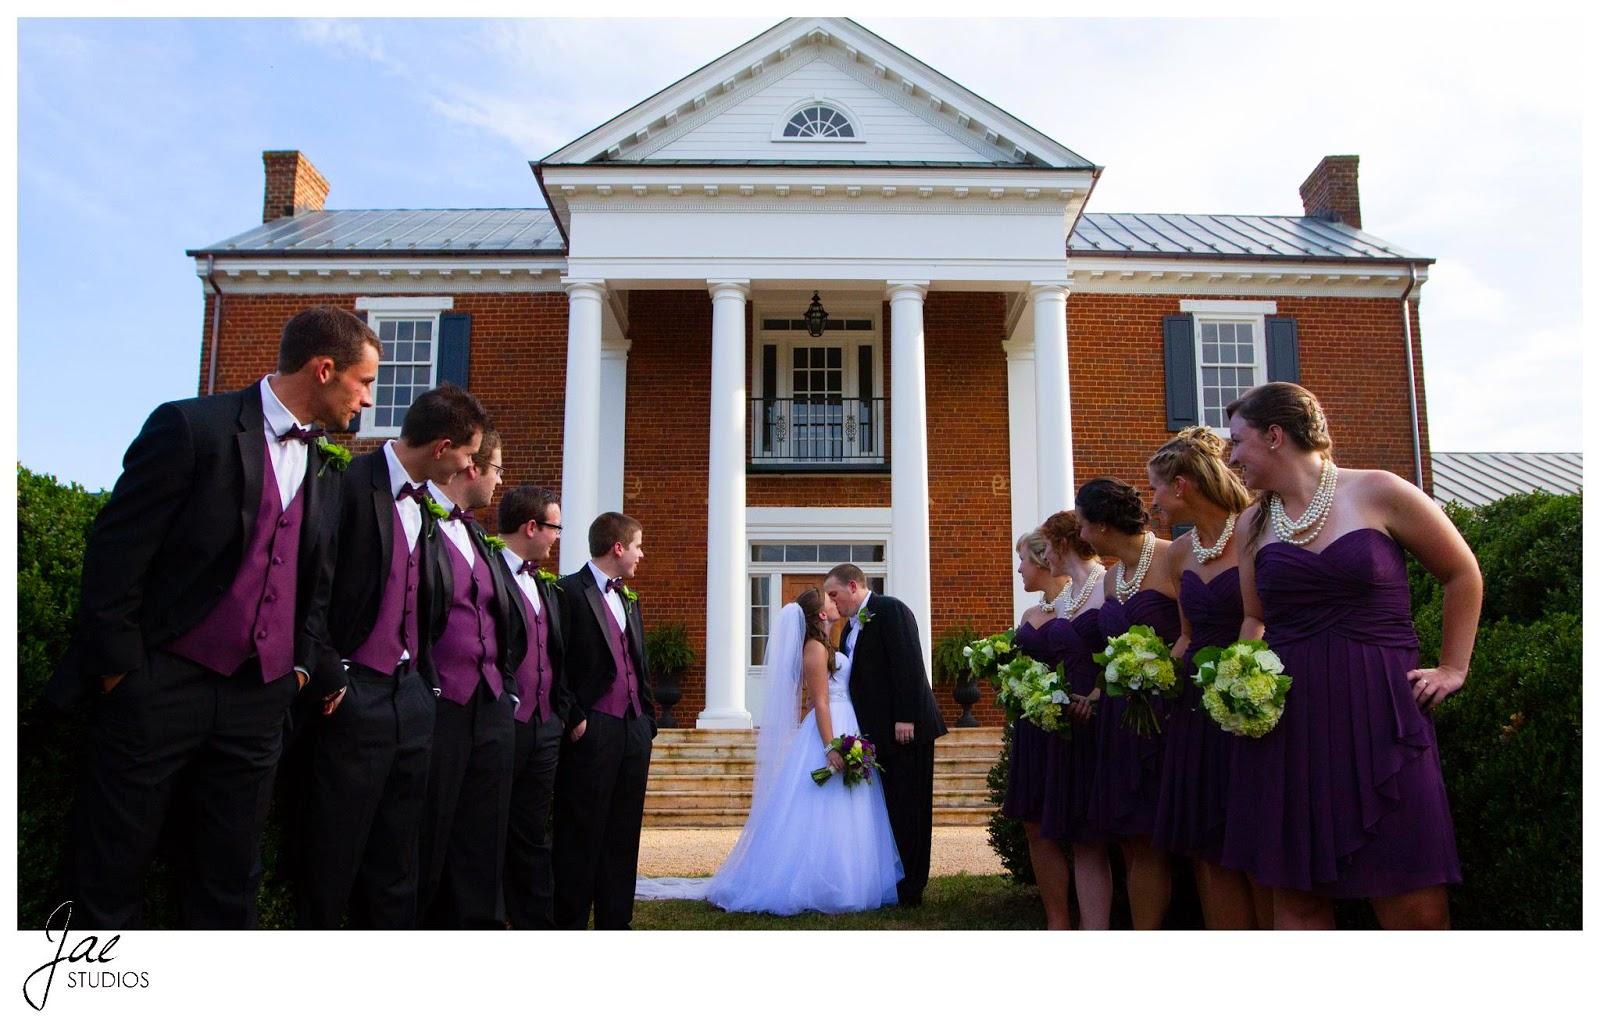 Jonathan and Julie, Bird cage, West Manor Estate, Wedding, Lynchburg, Virginia, Jae Studios, kissing, flowers, bouquet, boutonniere, purple, pearl, necklace